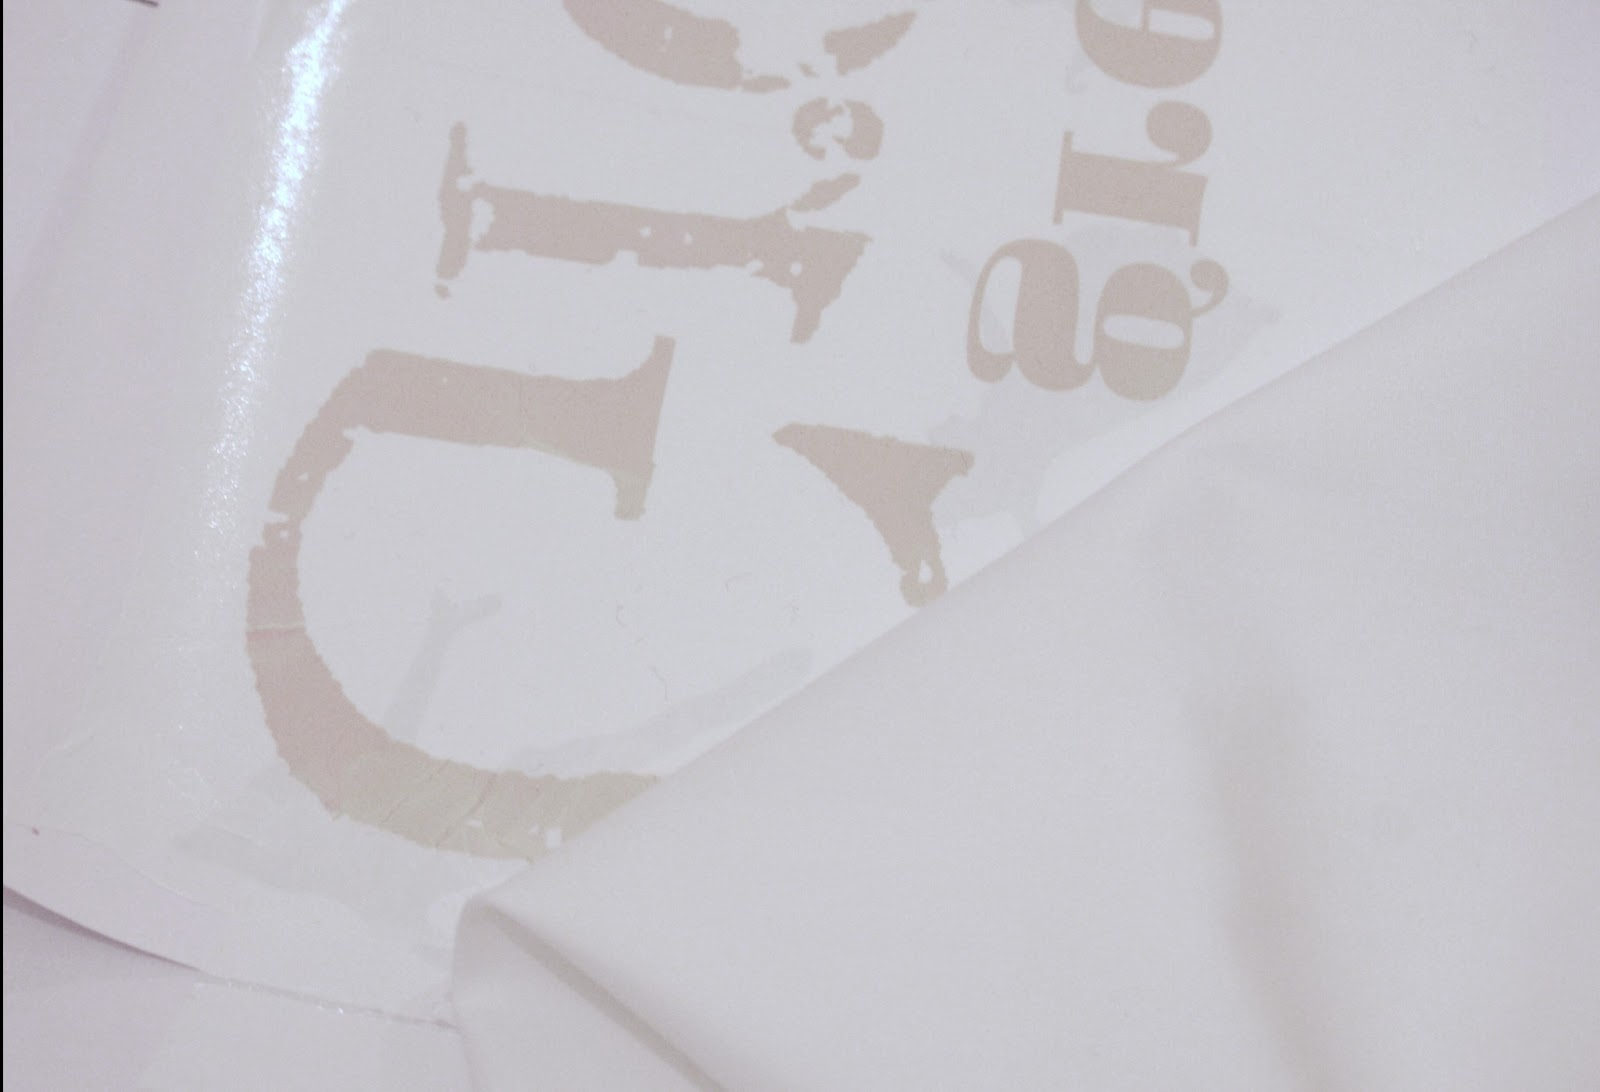 Screen-Rant-vividplease: How To Make Freezer Paper To Create Fabric ...